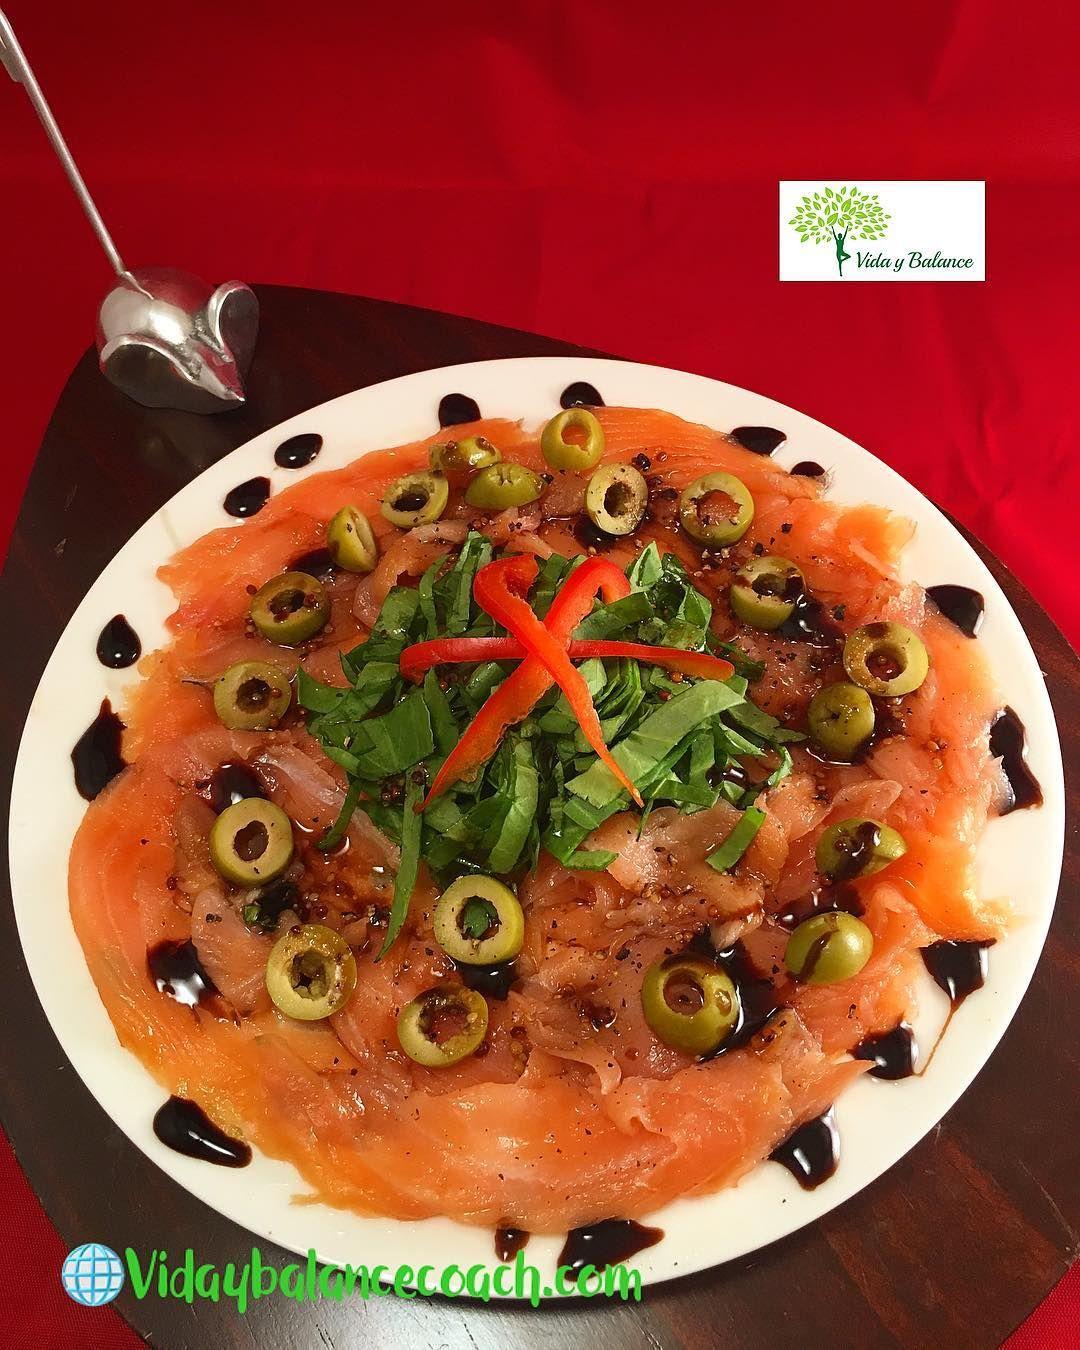 Carpacho De Salmon Ahumado Excelente Opcion Para